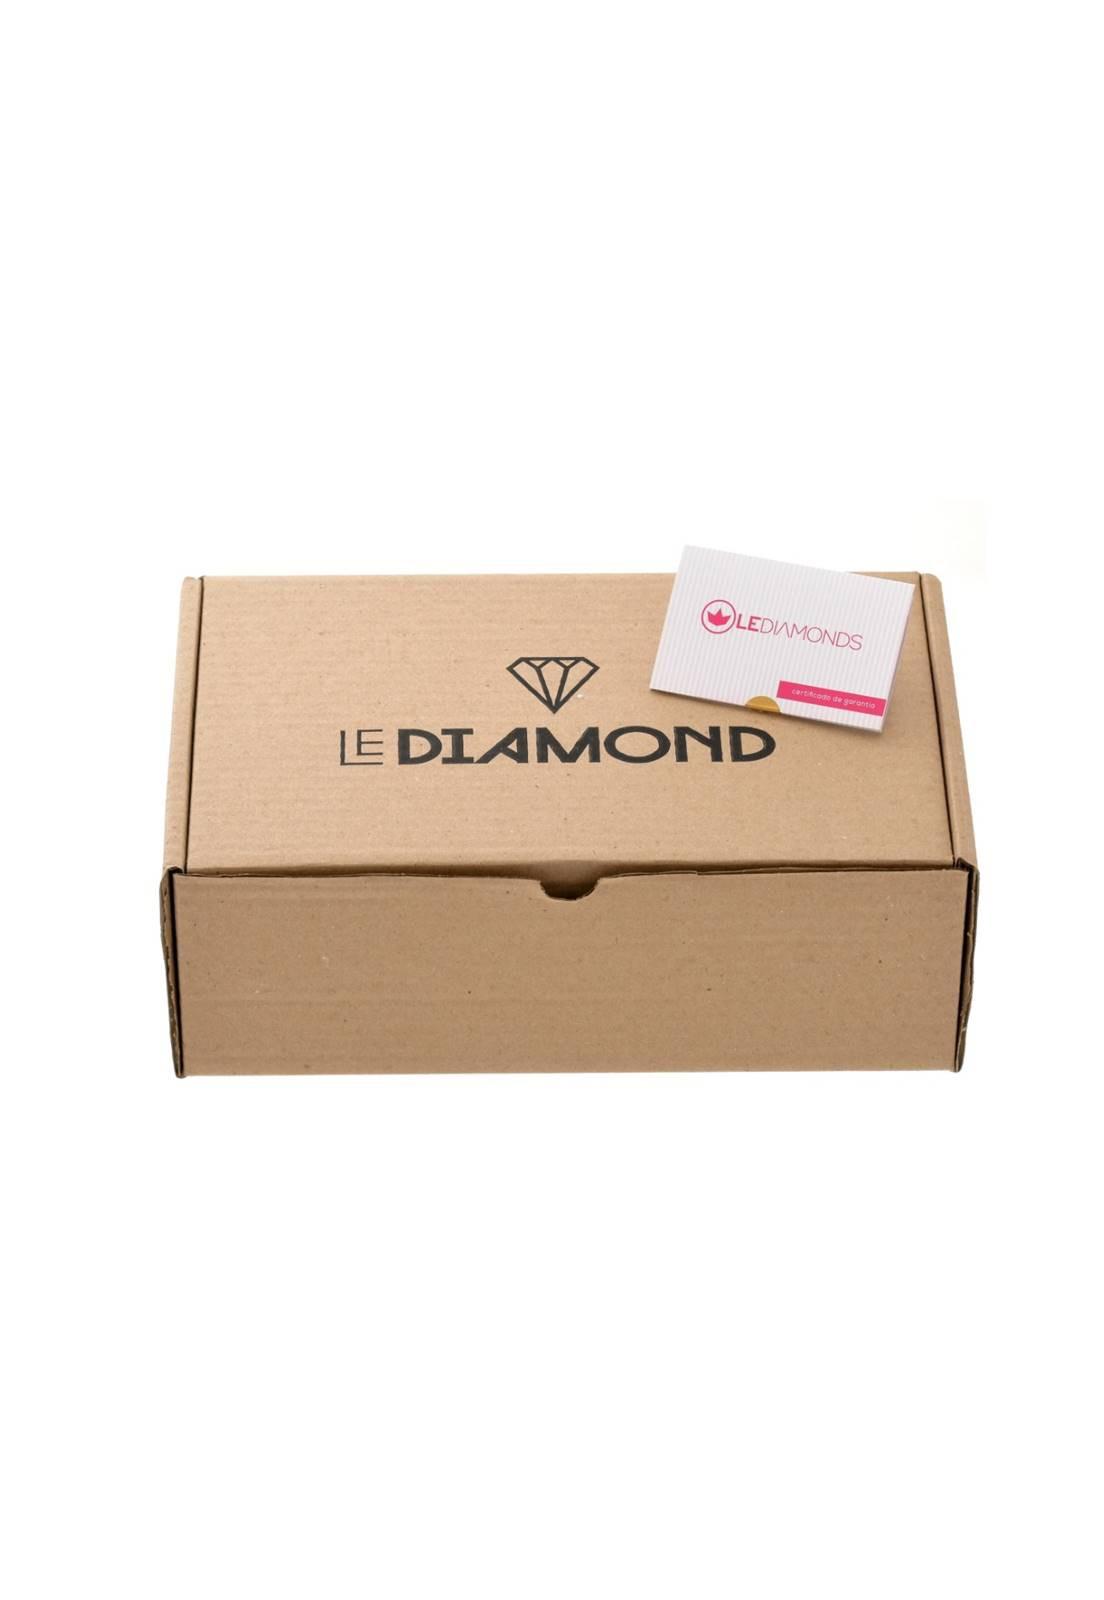 Brinco Le Diamond Pendulo com Esferas Amarelo